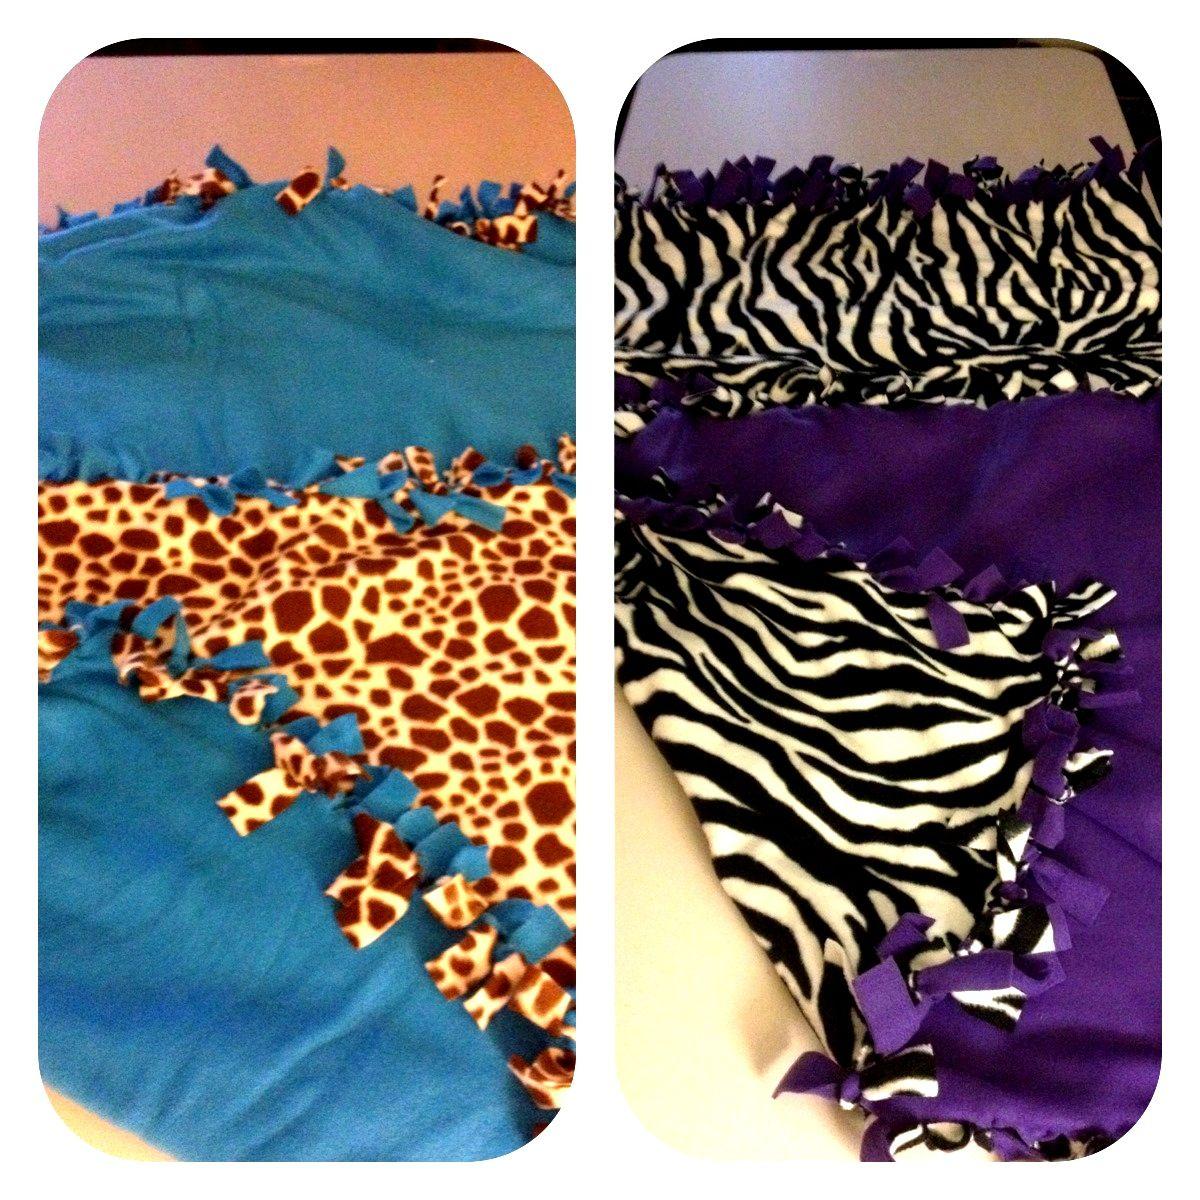 Fleece animal printneon blankets for the kids zebra blankets